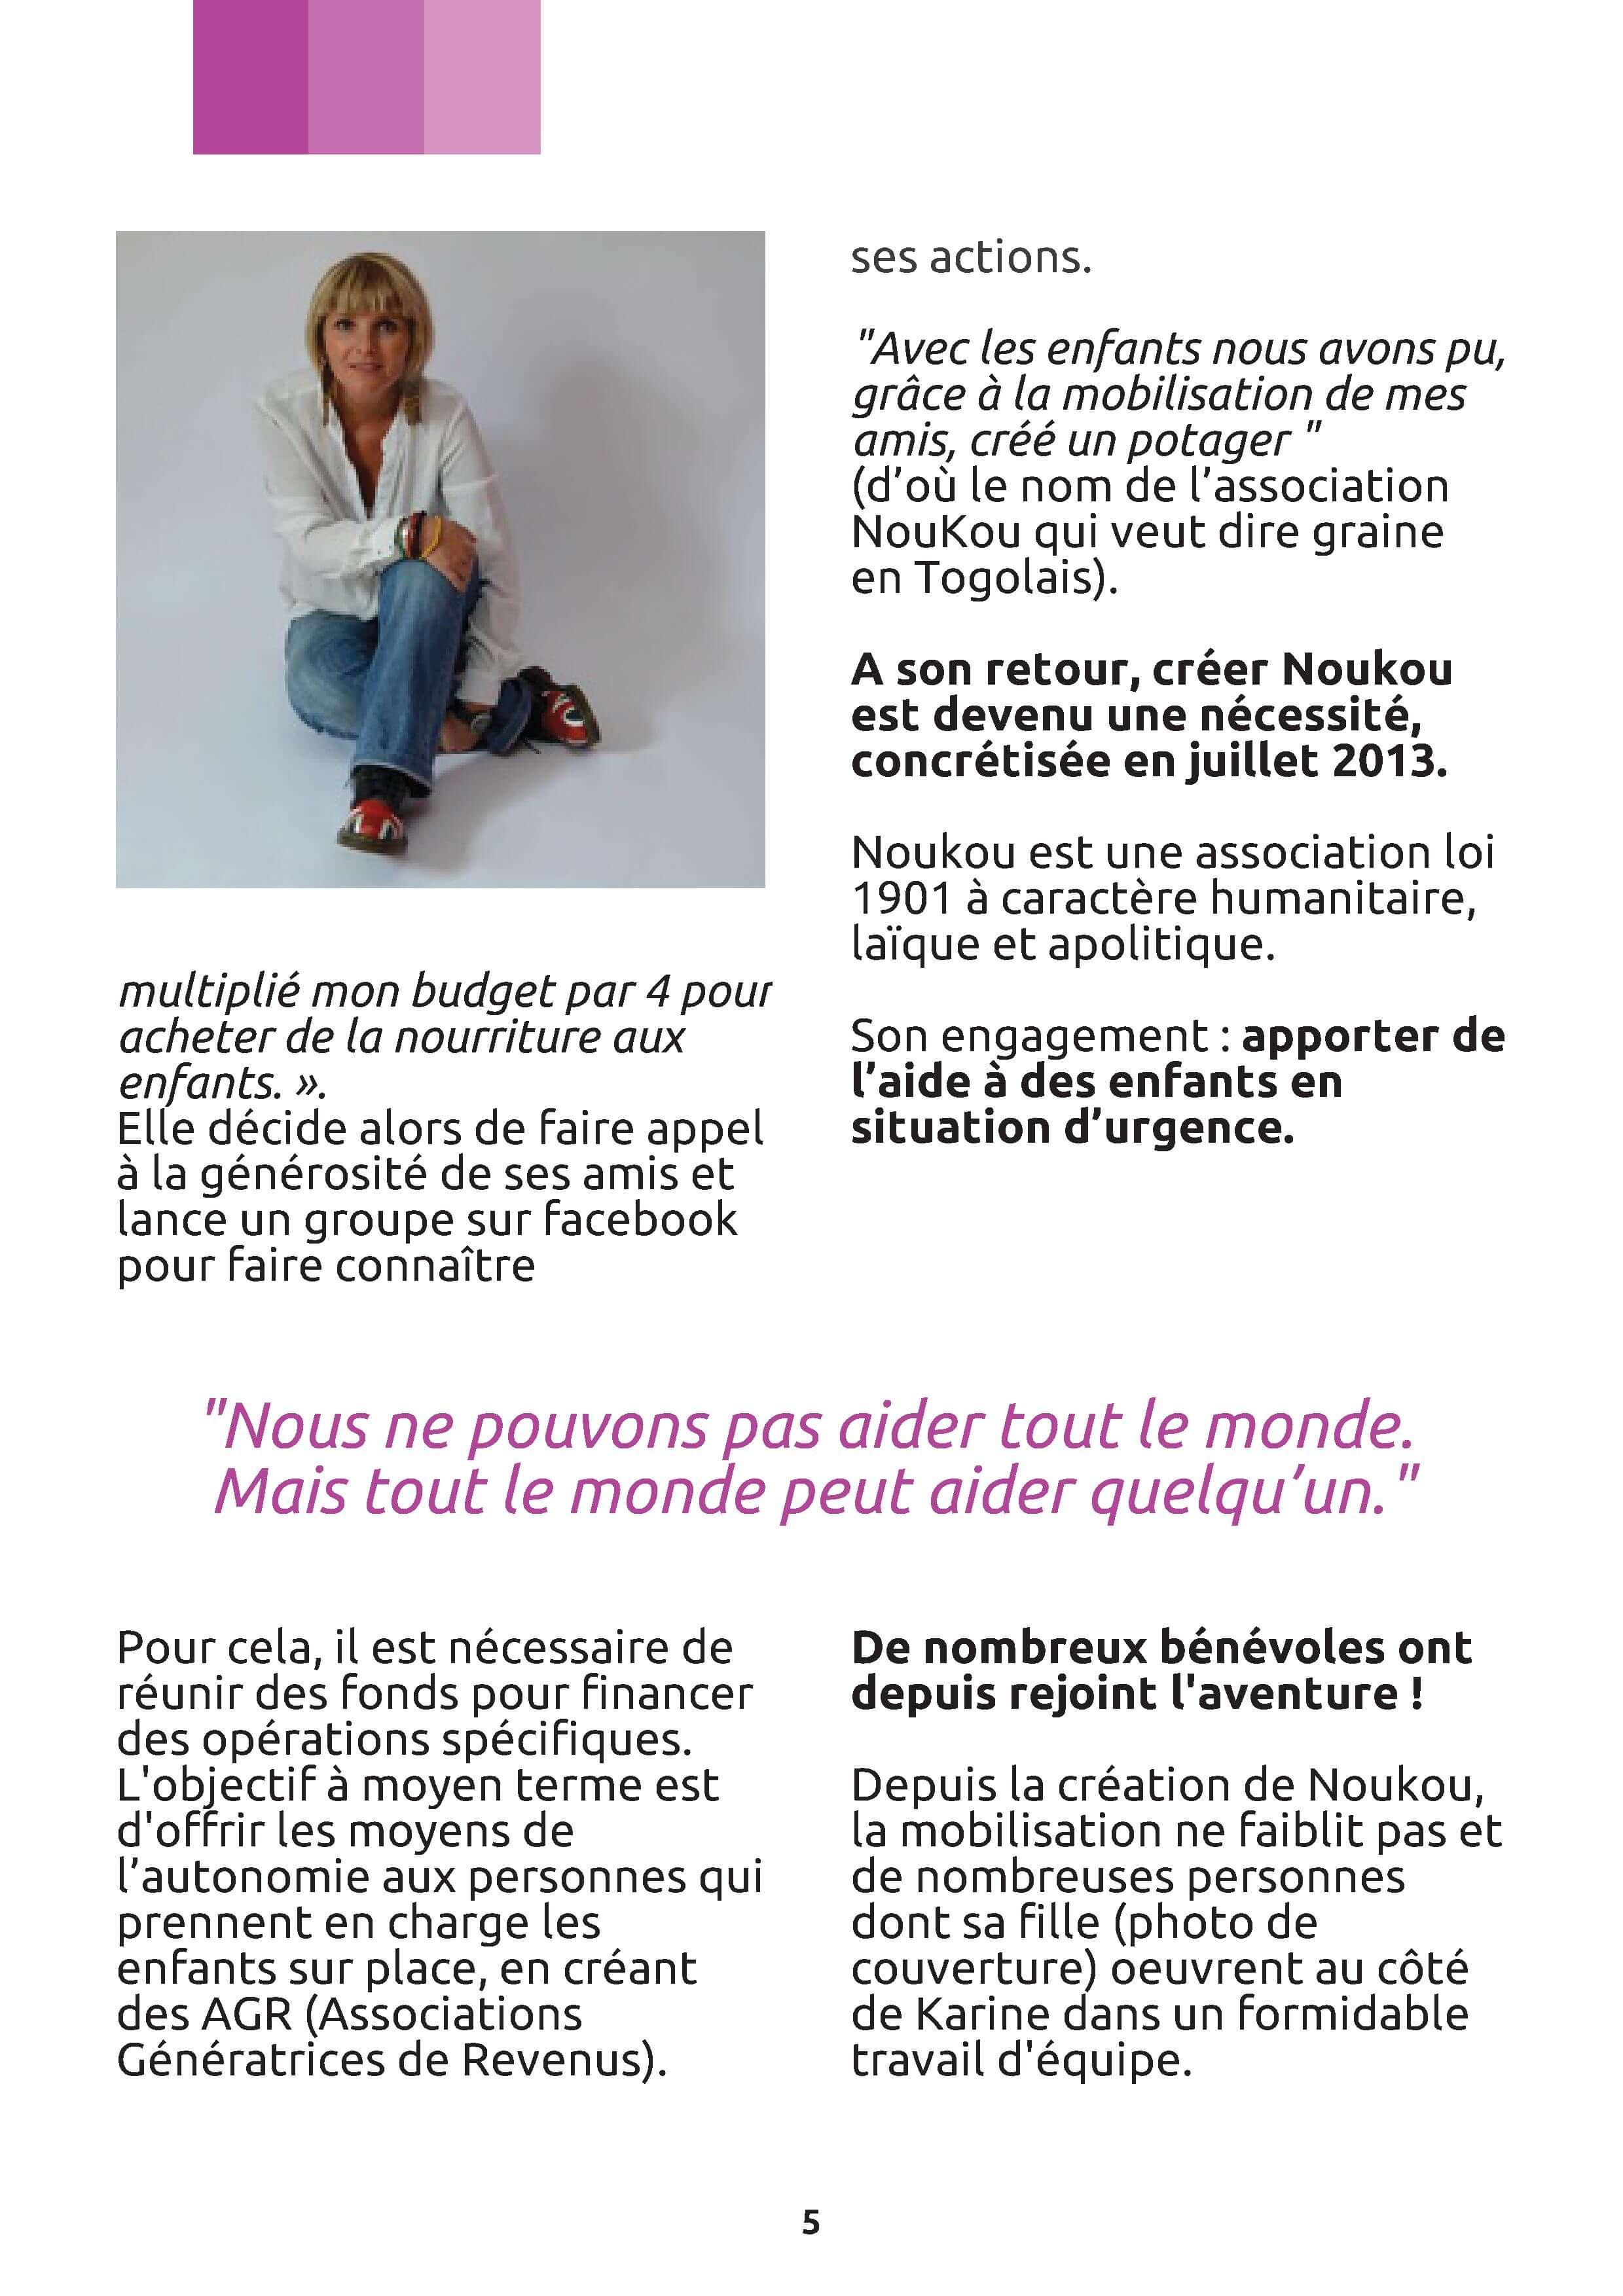 article-karine-benoit-p.2-magsesame-n°-7-Novembre-2013